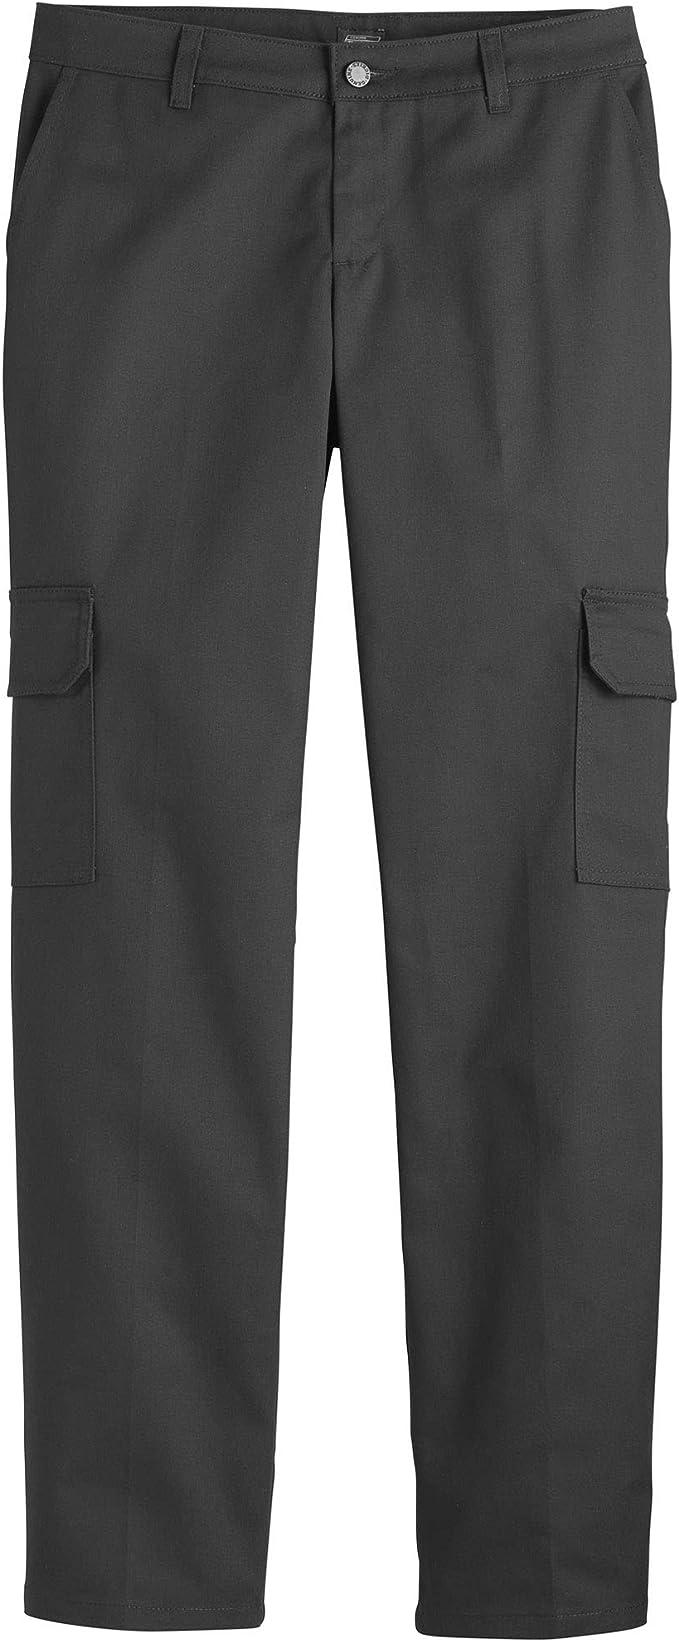 Women's Dickies Straight Leg Stretch Twill Rinsed Black Cargo Pants FP514